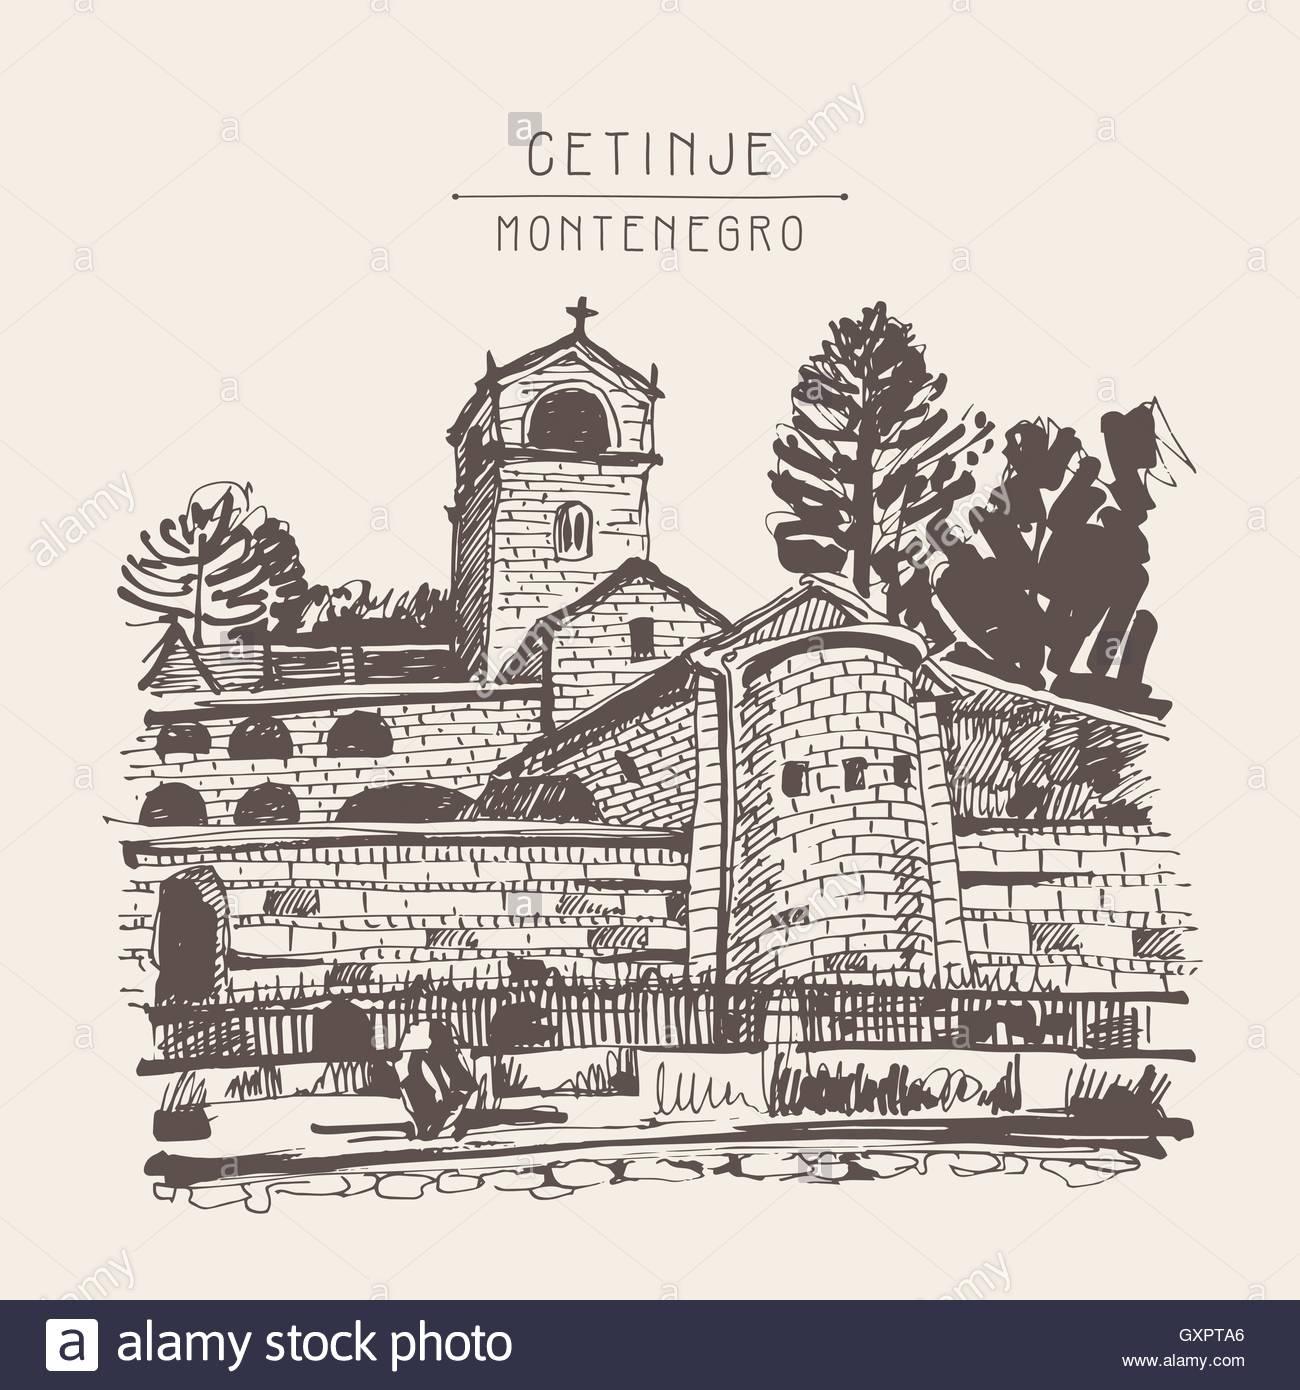 1300x1390 Sepia Hand Drawing Of Cetinje Monastery